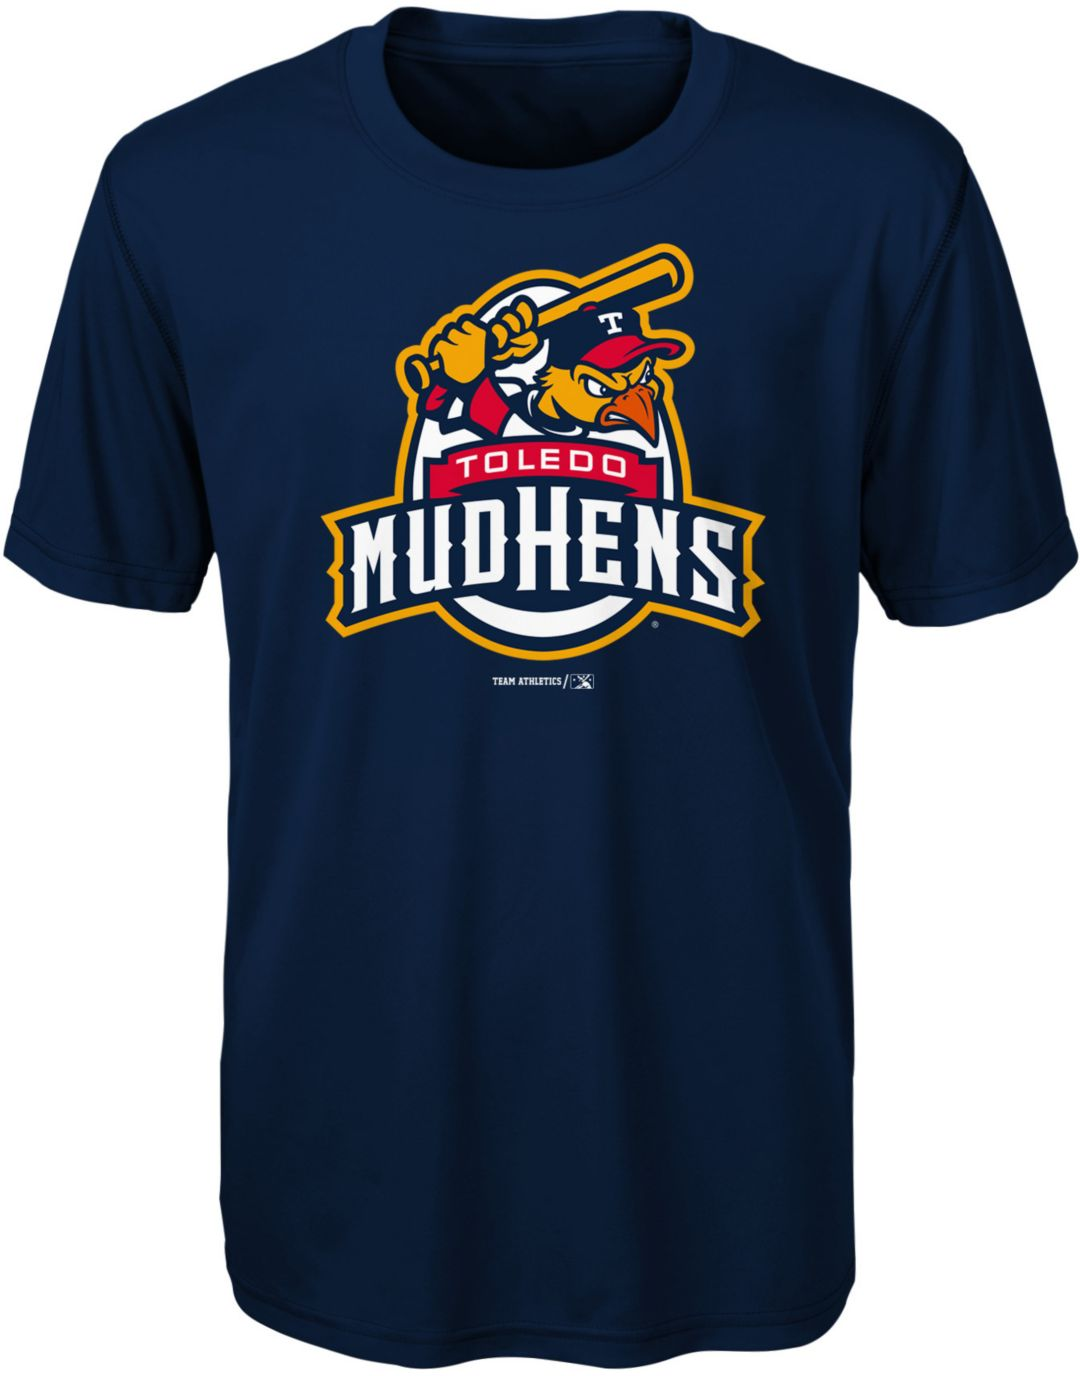 Majestic Youth Toledo Mud Hens Navy T-Shirt